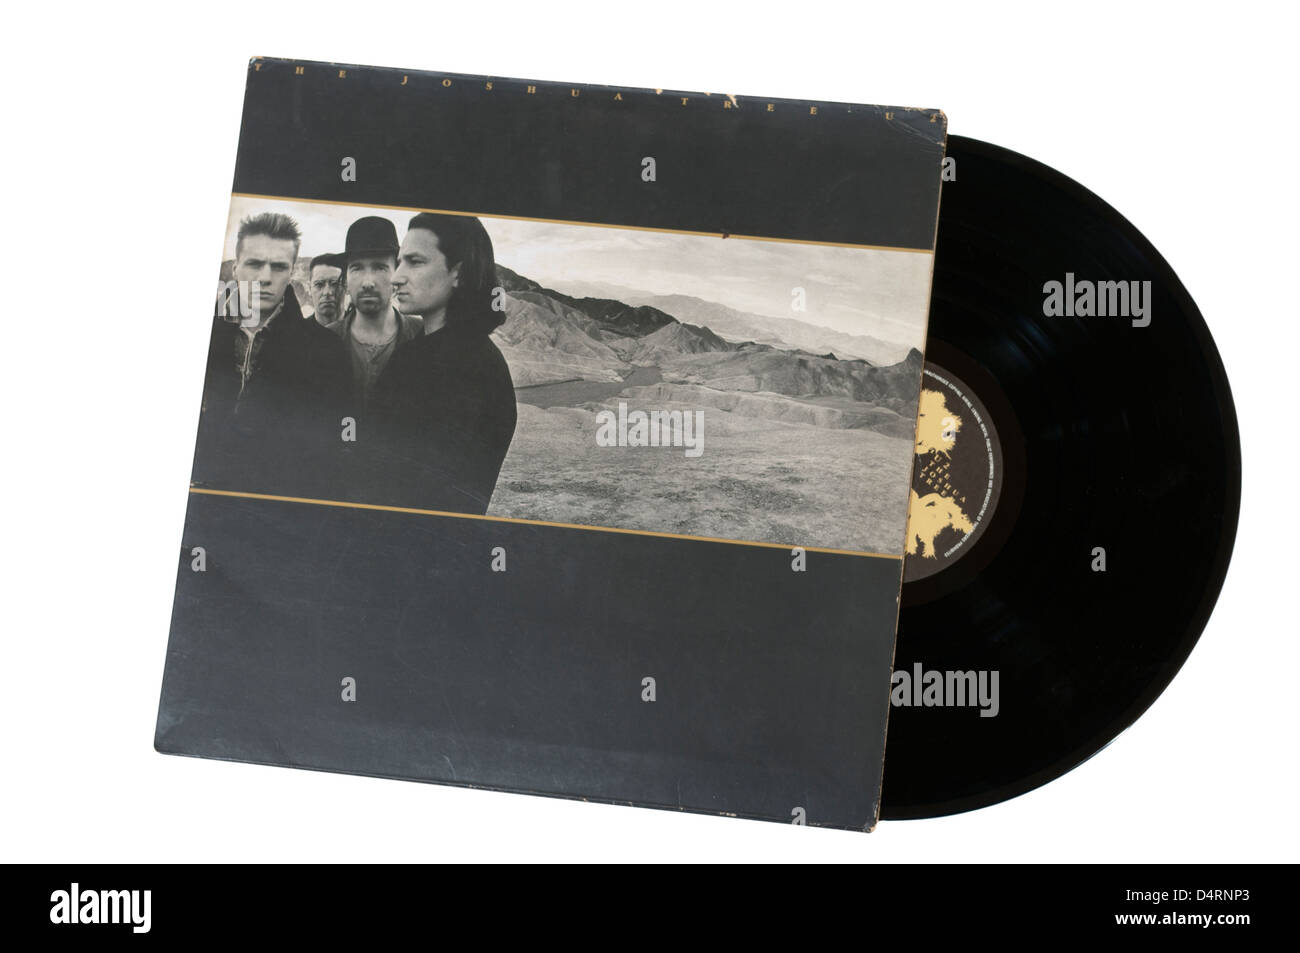 U2 The Joshua Tree Vinyl Record LP - Stock Image